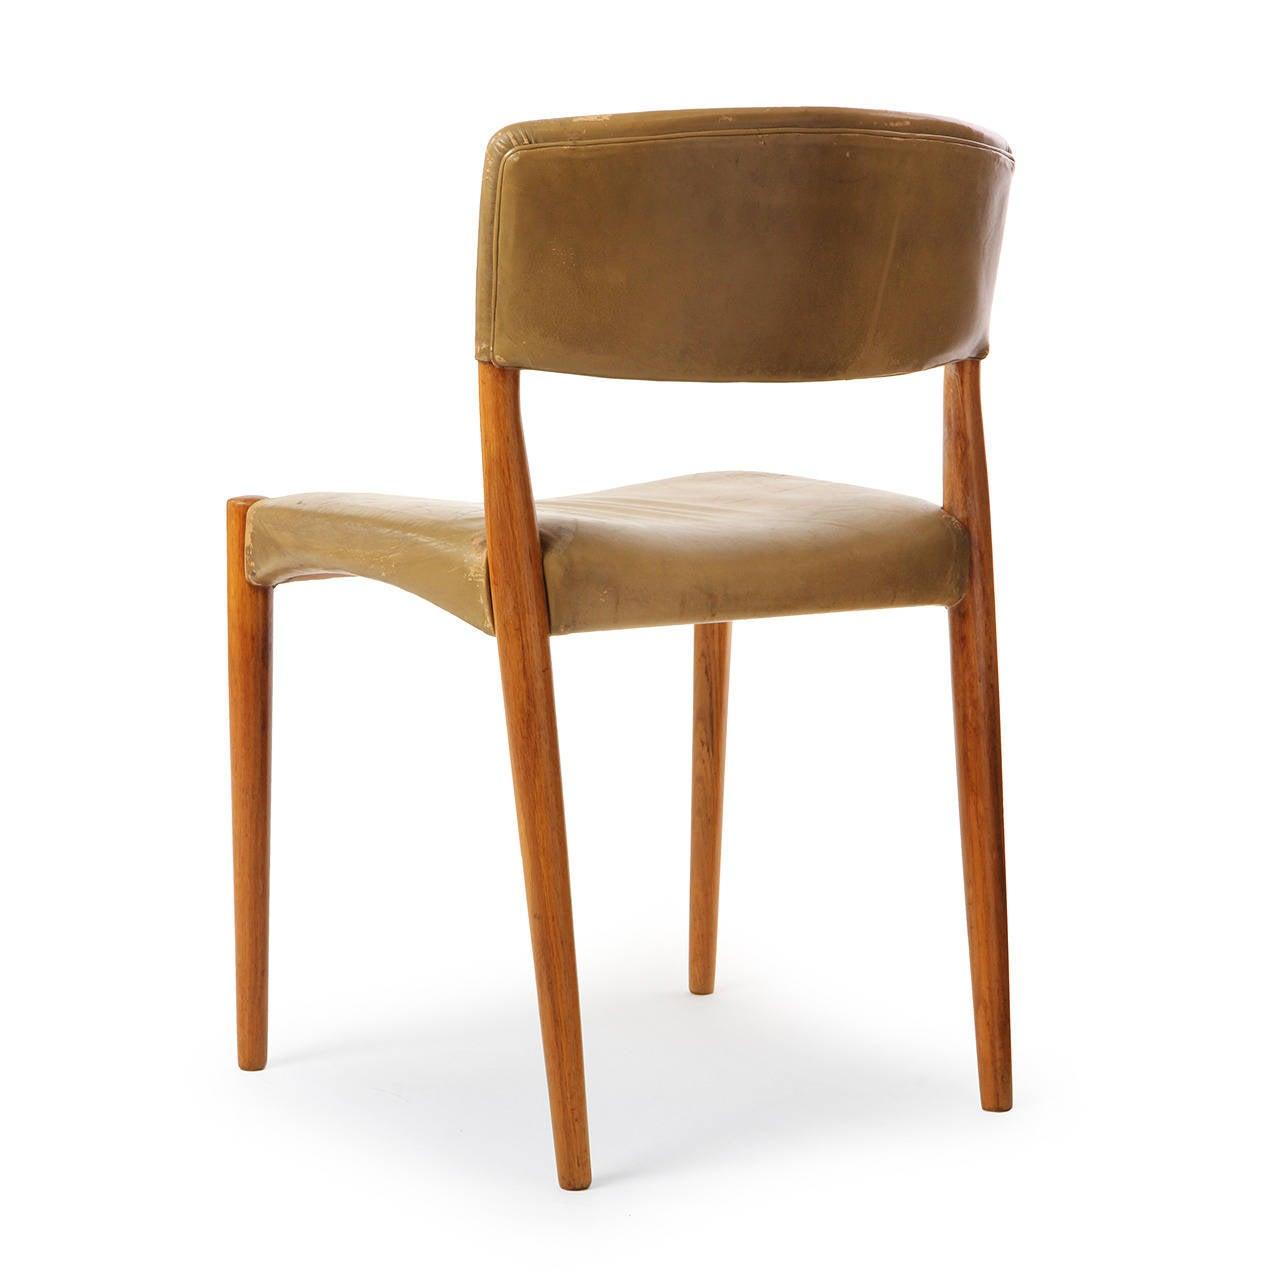 Danish Mid Century Dining Chairs Images 25 Midcentury